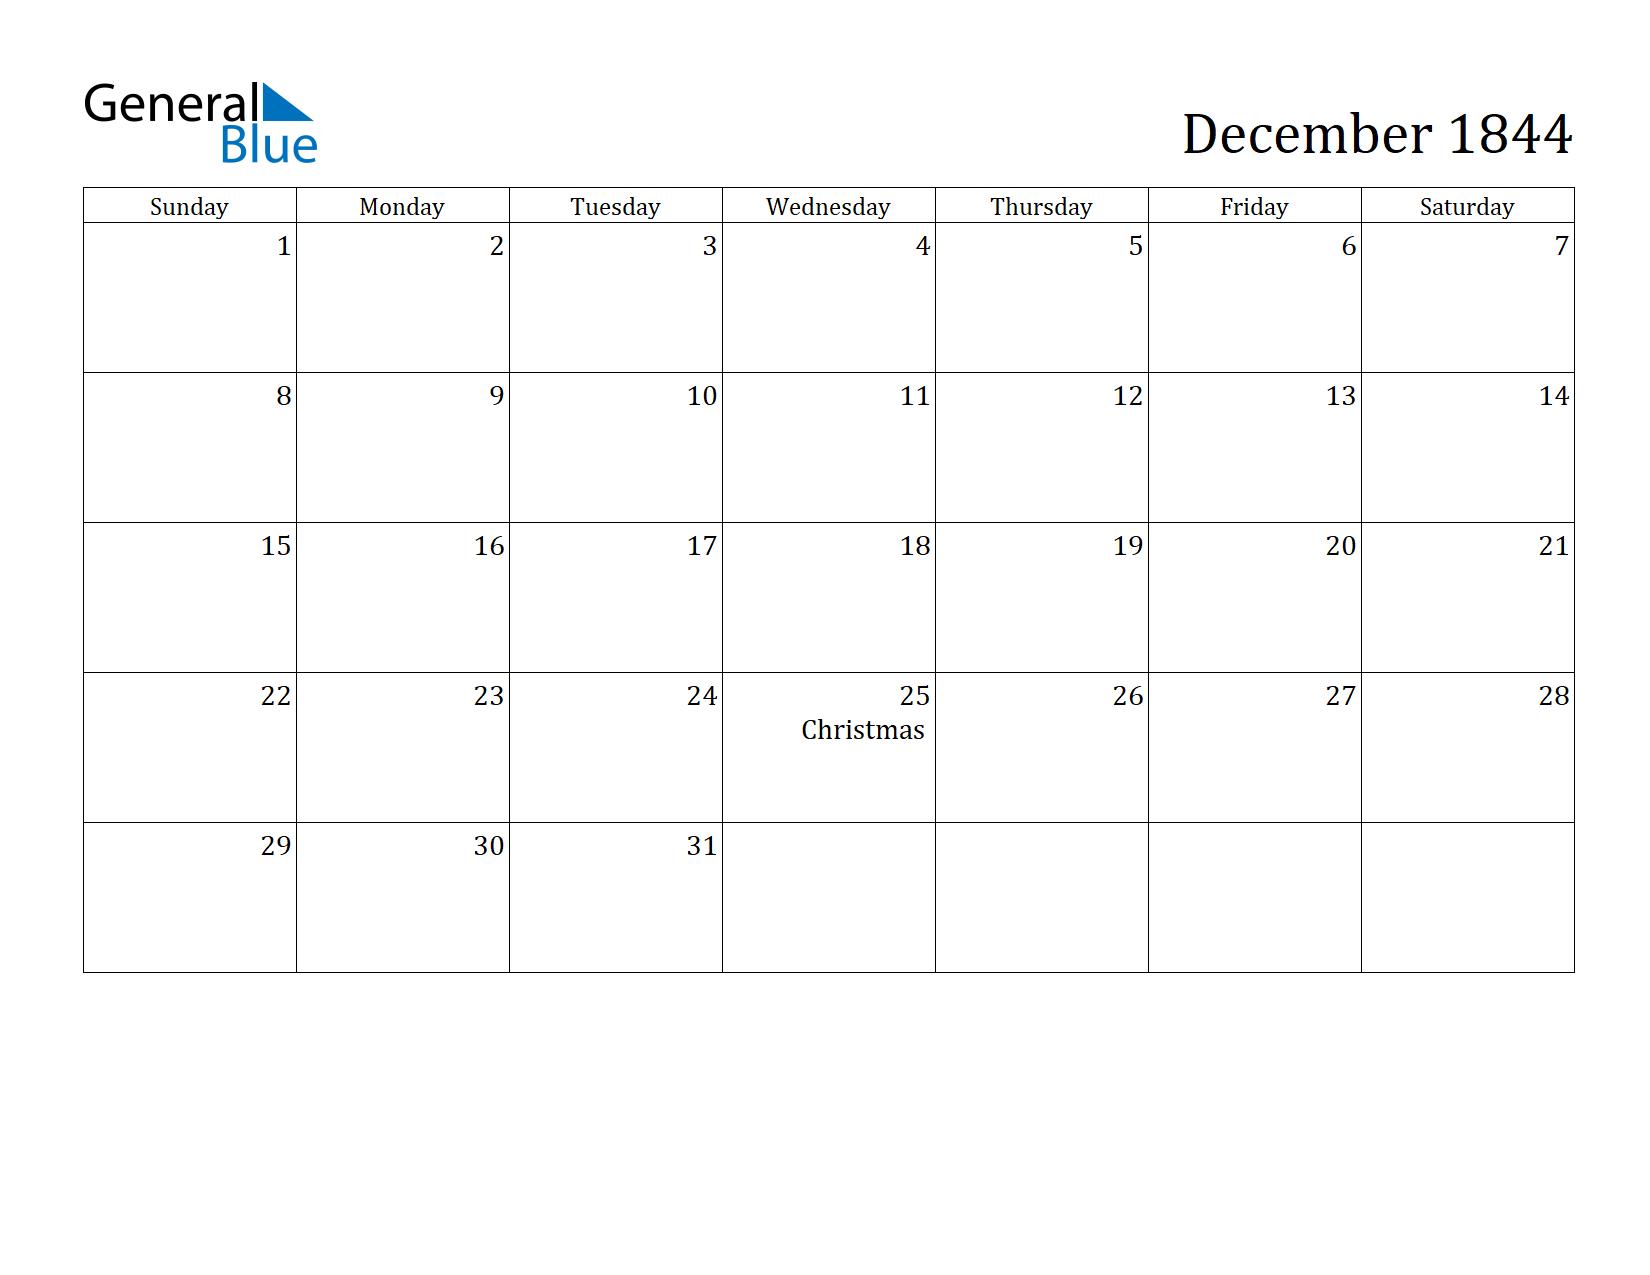 Image of December 1844 Calendar